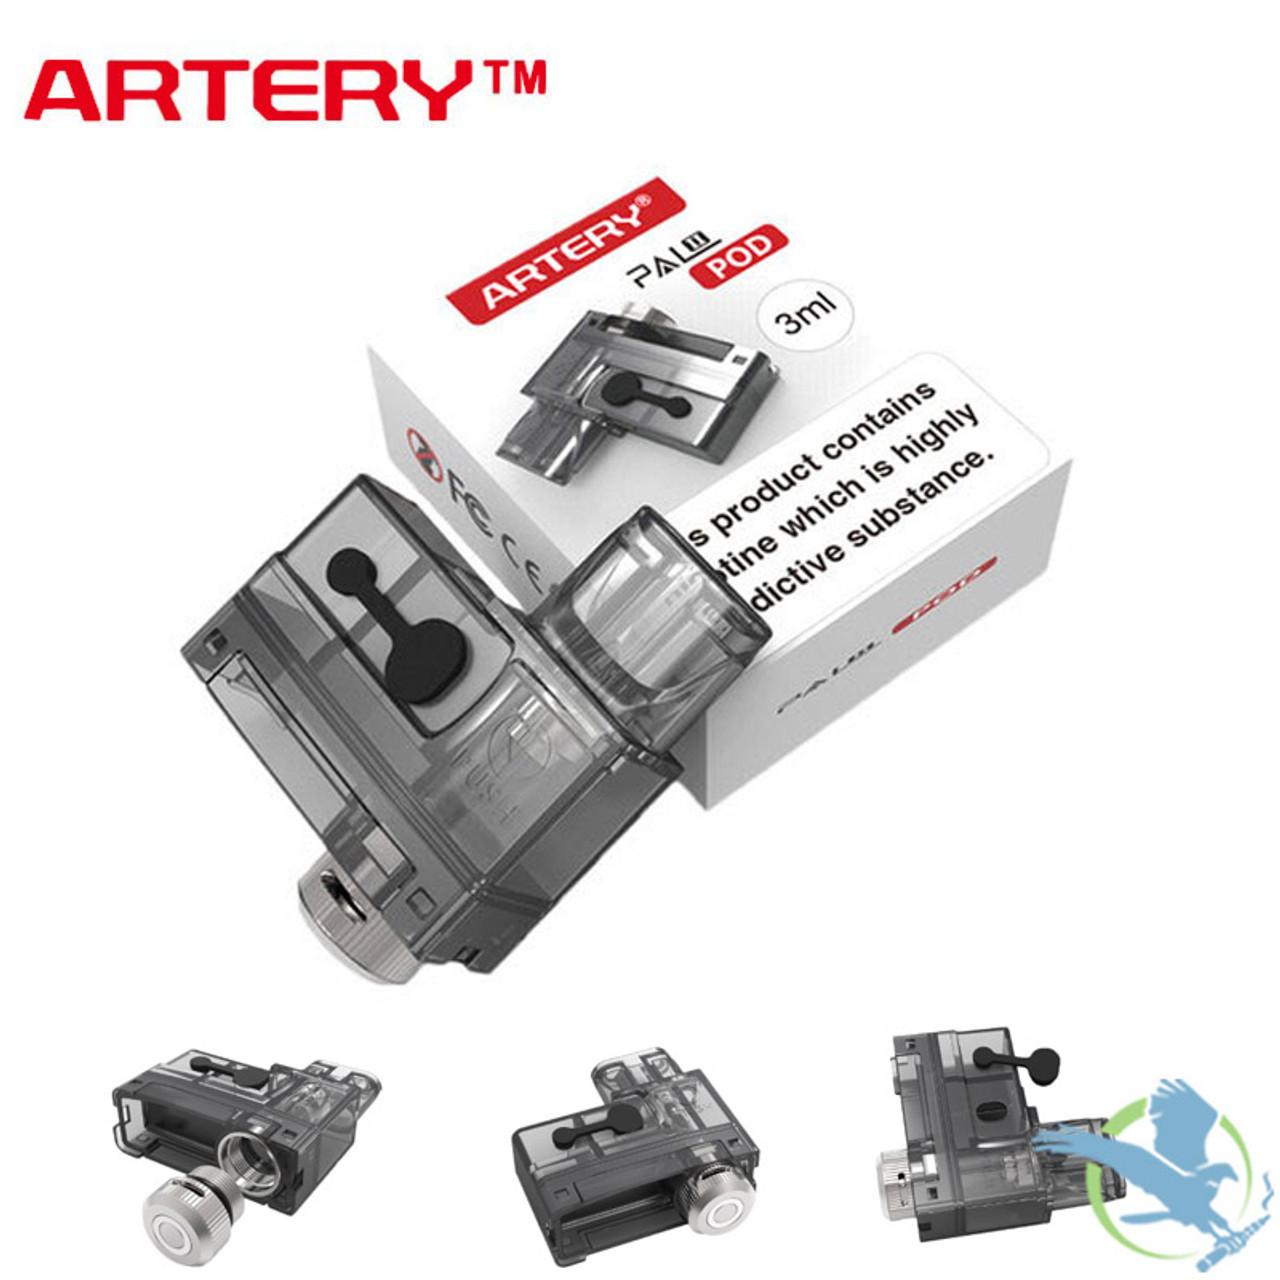 Artery PAL II 3ML Replacement Pod Cartridge - Single (MSRP $5 00)